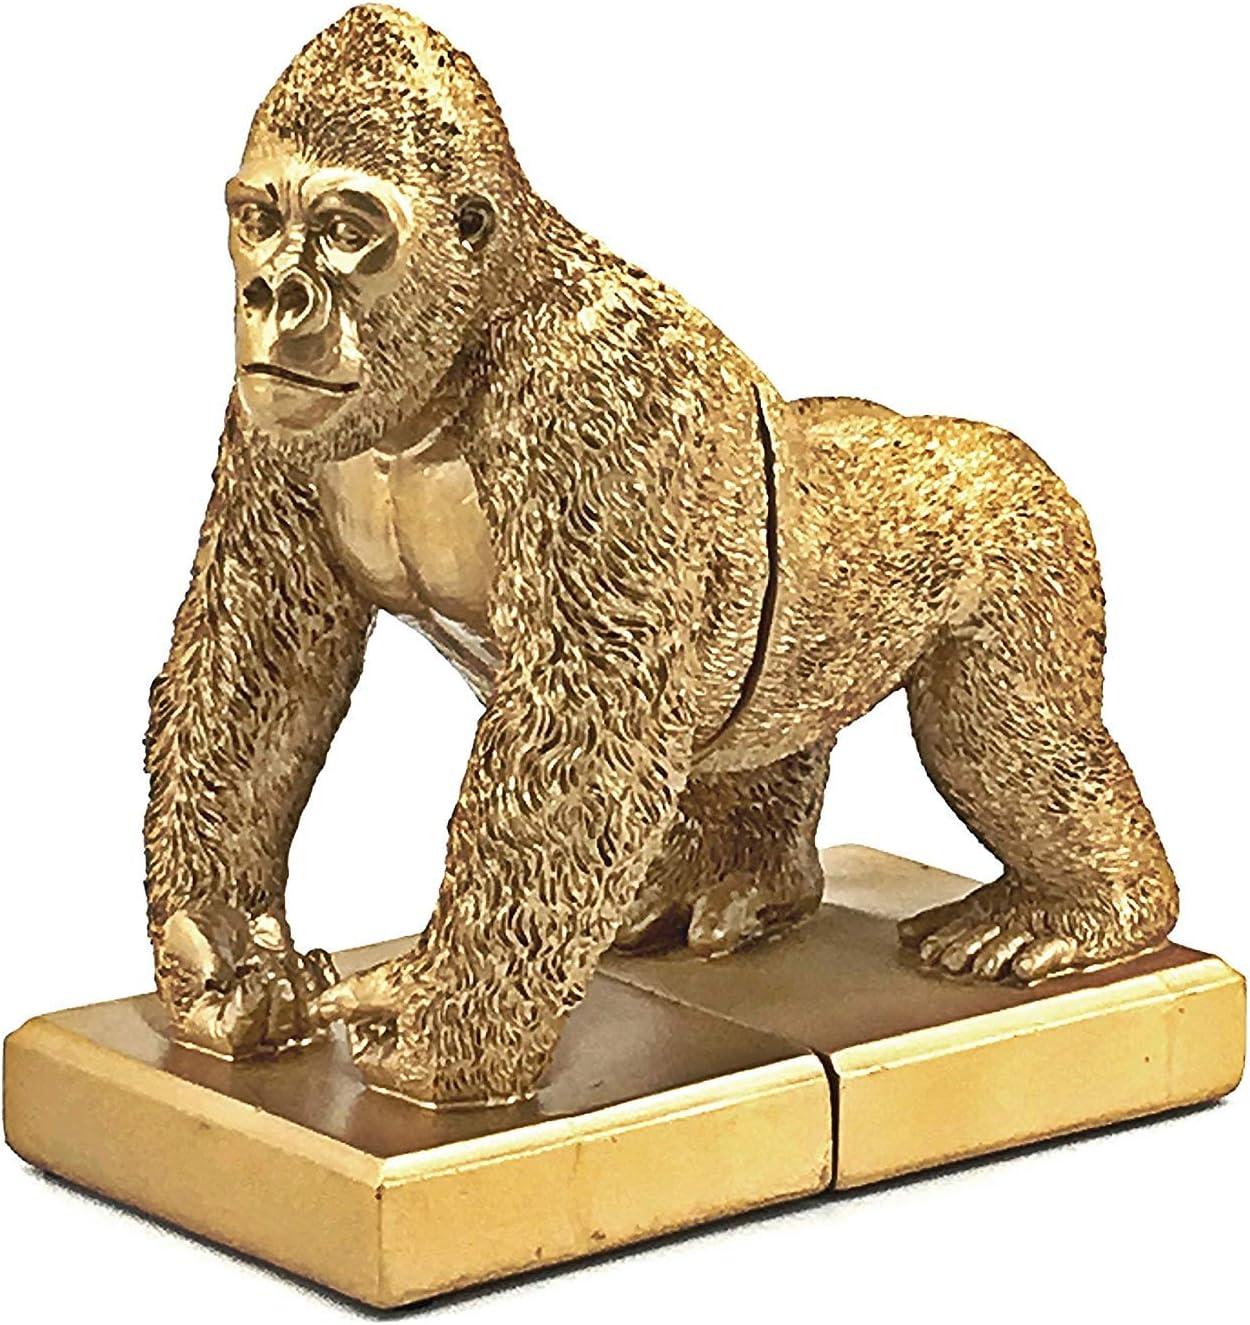 Bellaa 24193 Bookends Decorative Gold Heavy Books Shelves Non Skid Heavy Duty Kids Gorilla King Kong 8 inch